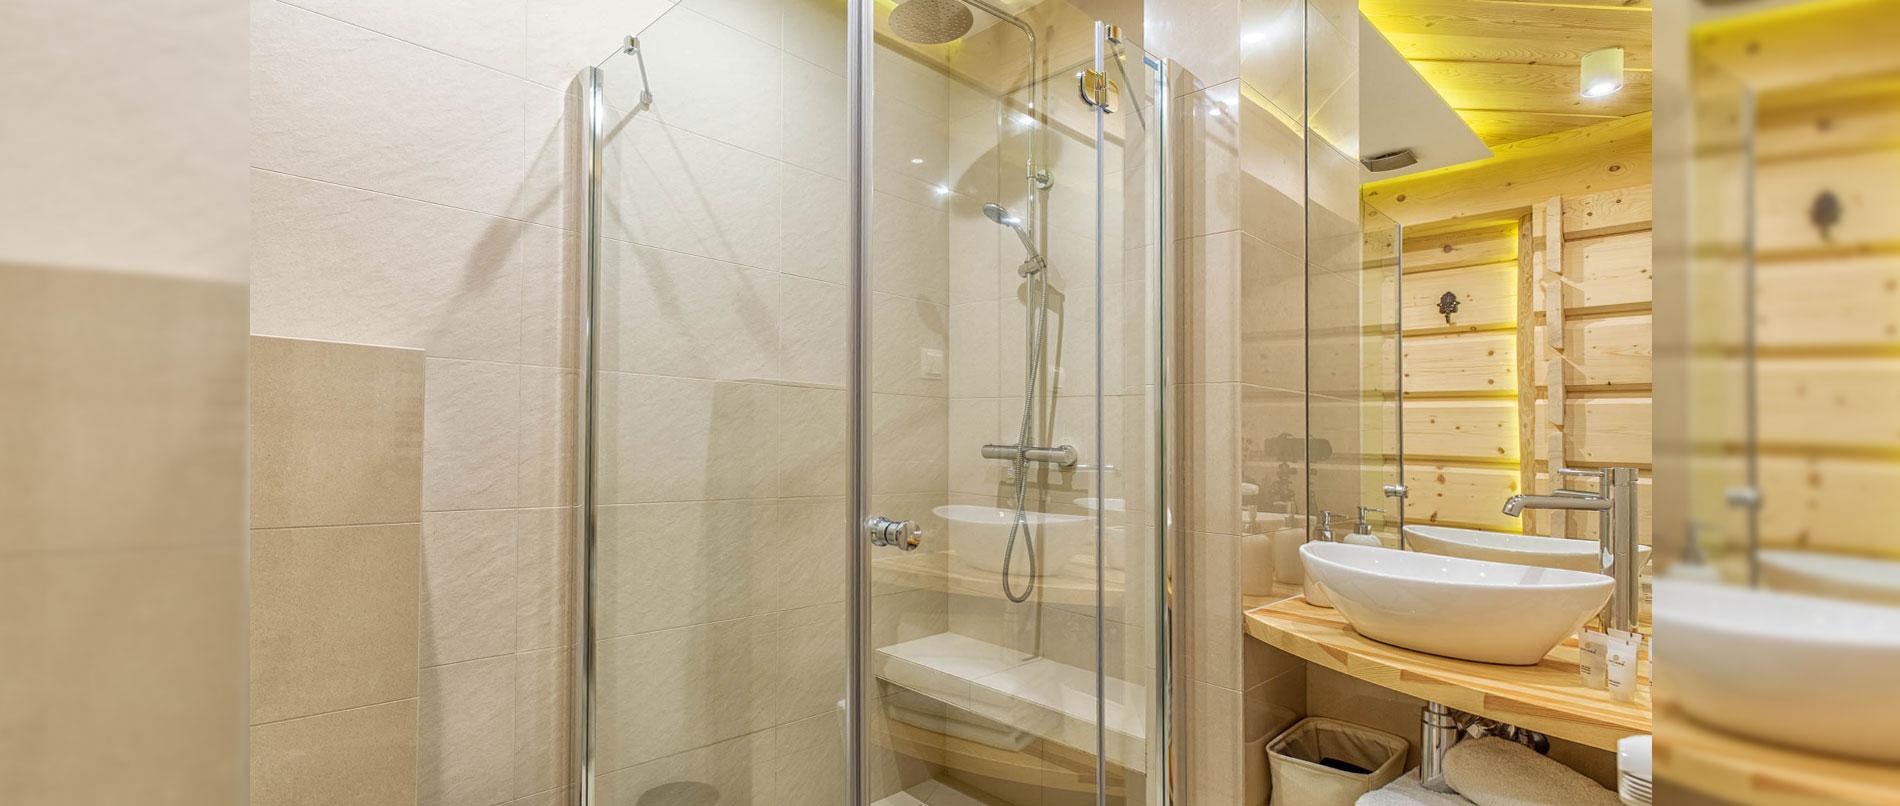 Apartament Premium 1 - łazienka